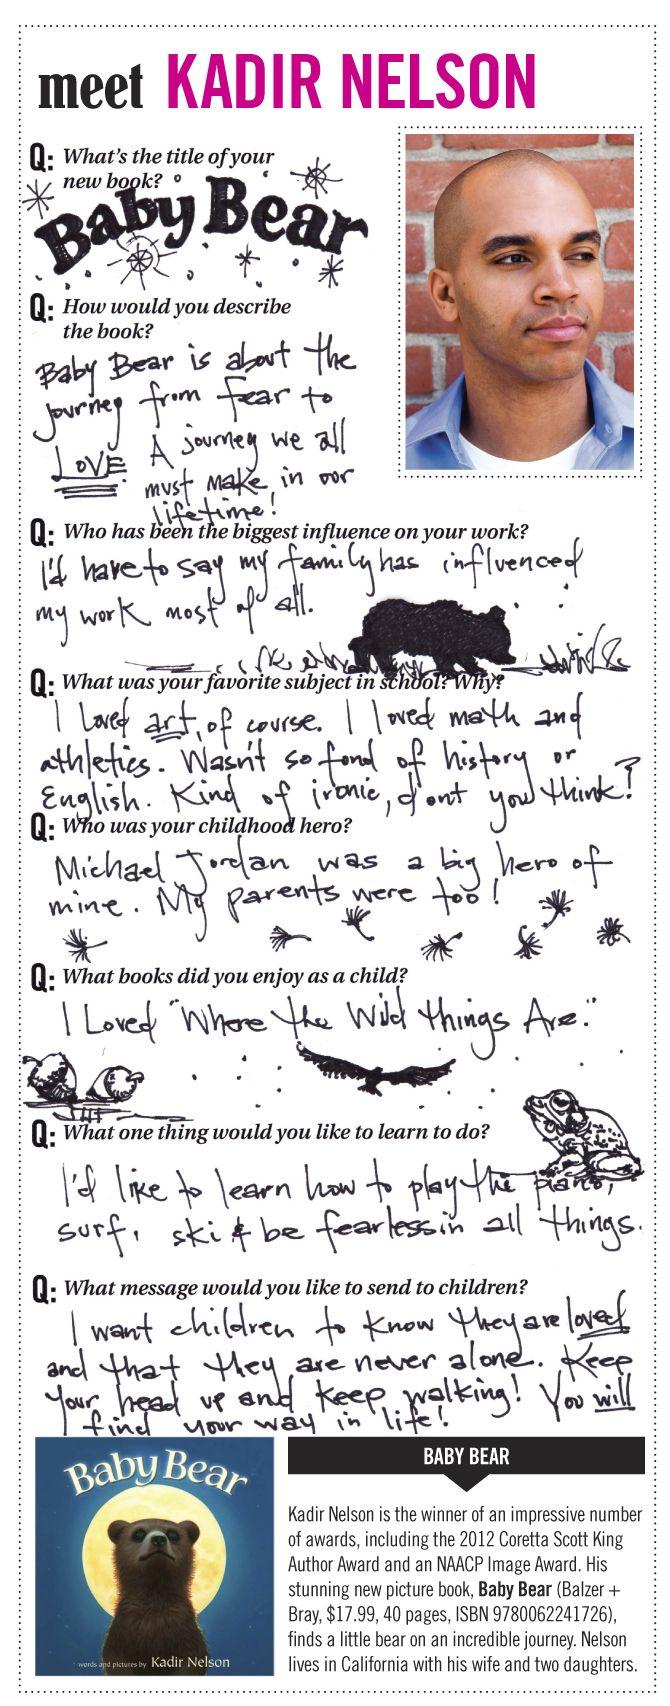 Meet Kadir Nelson, author-illustrator of BABY BEAR!